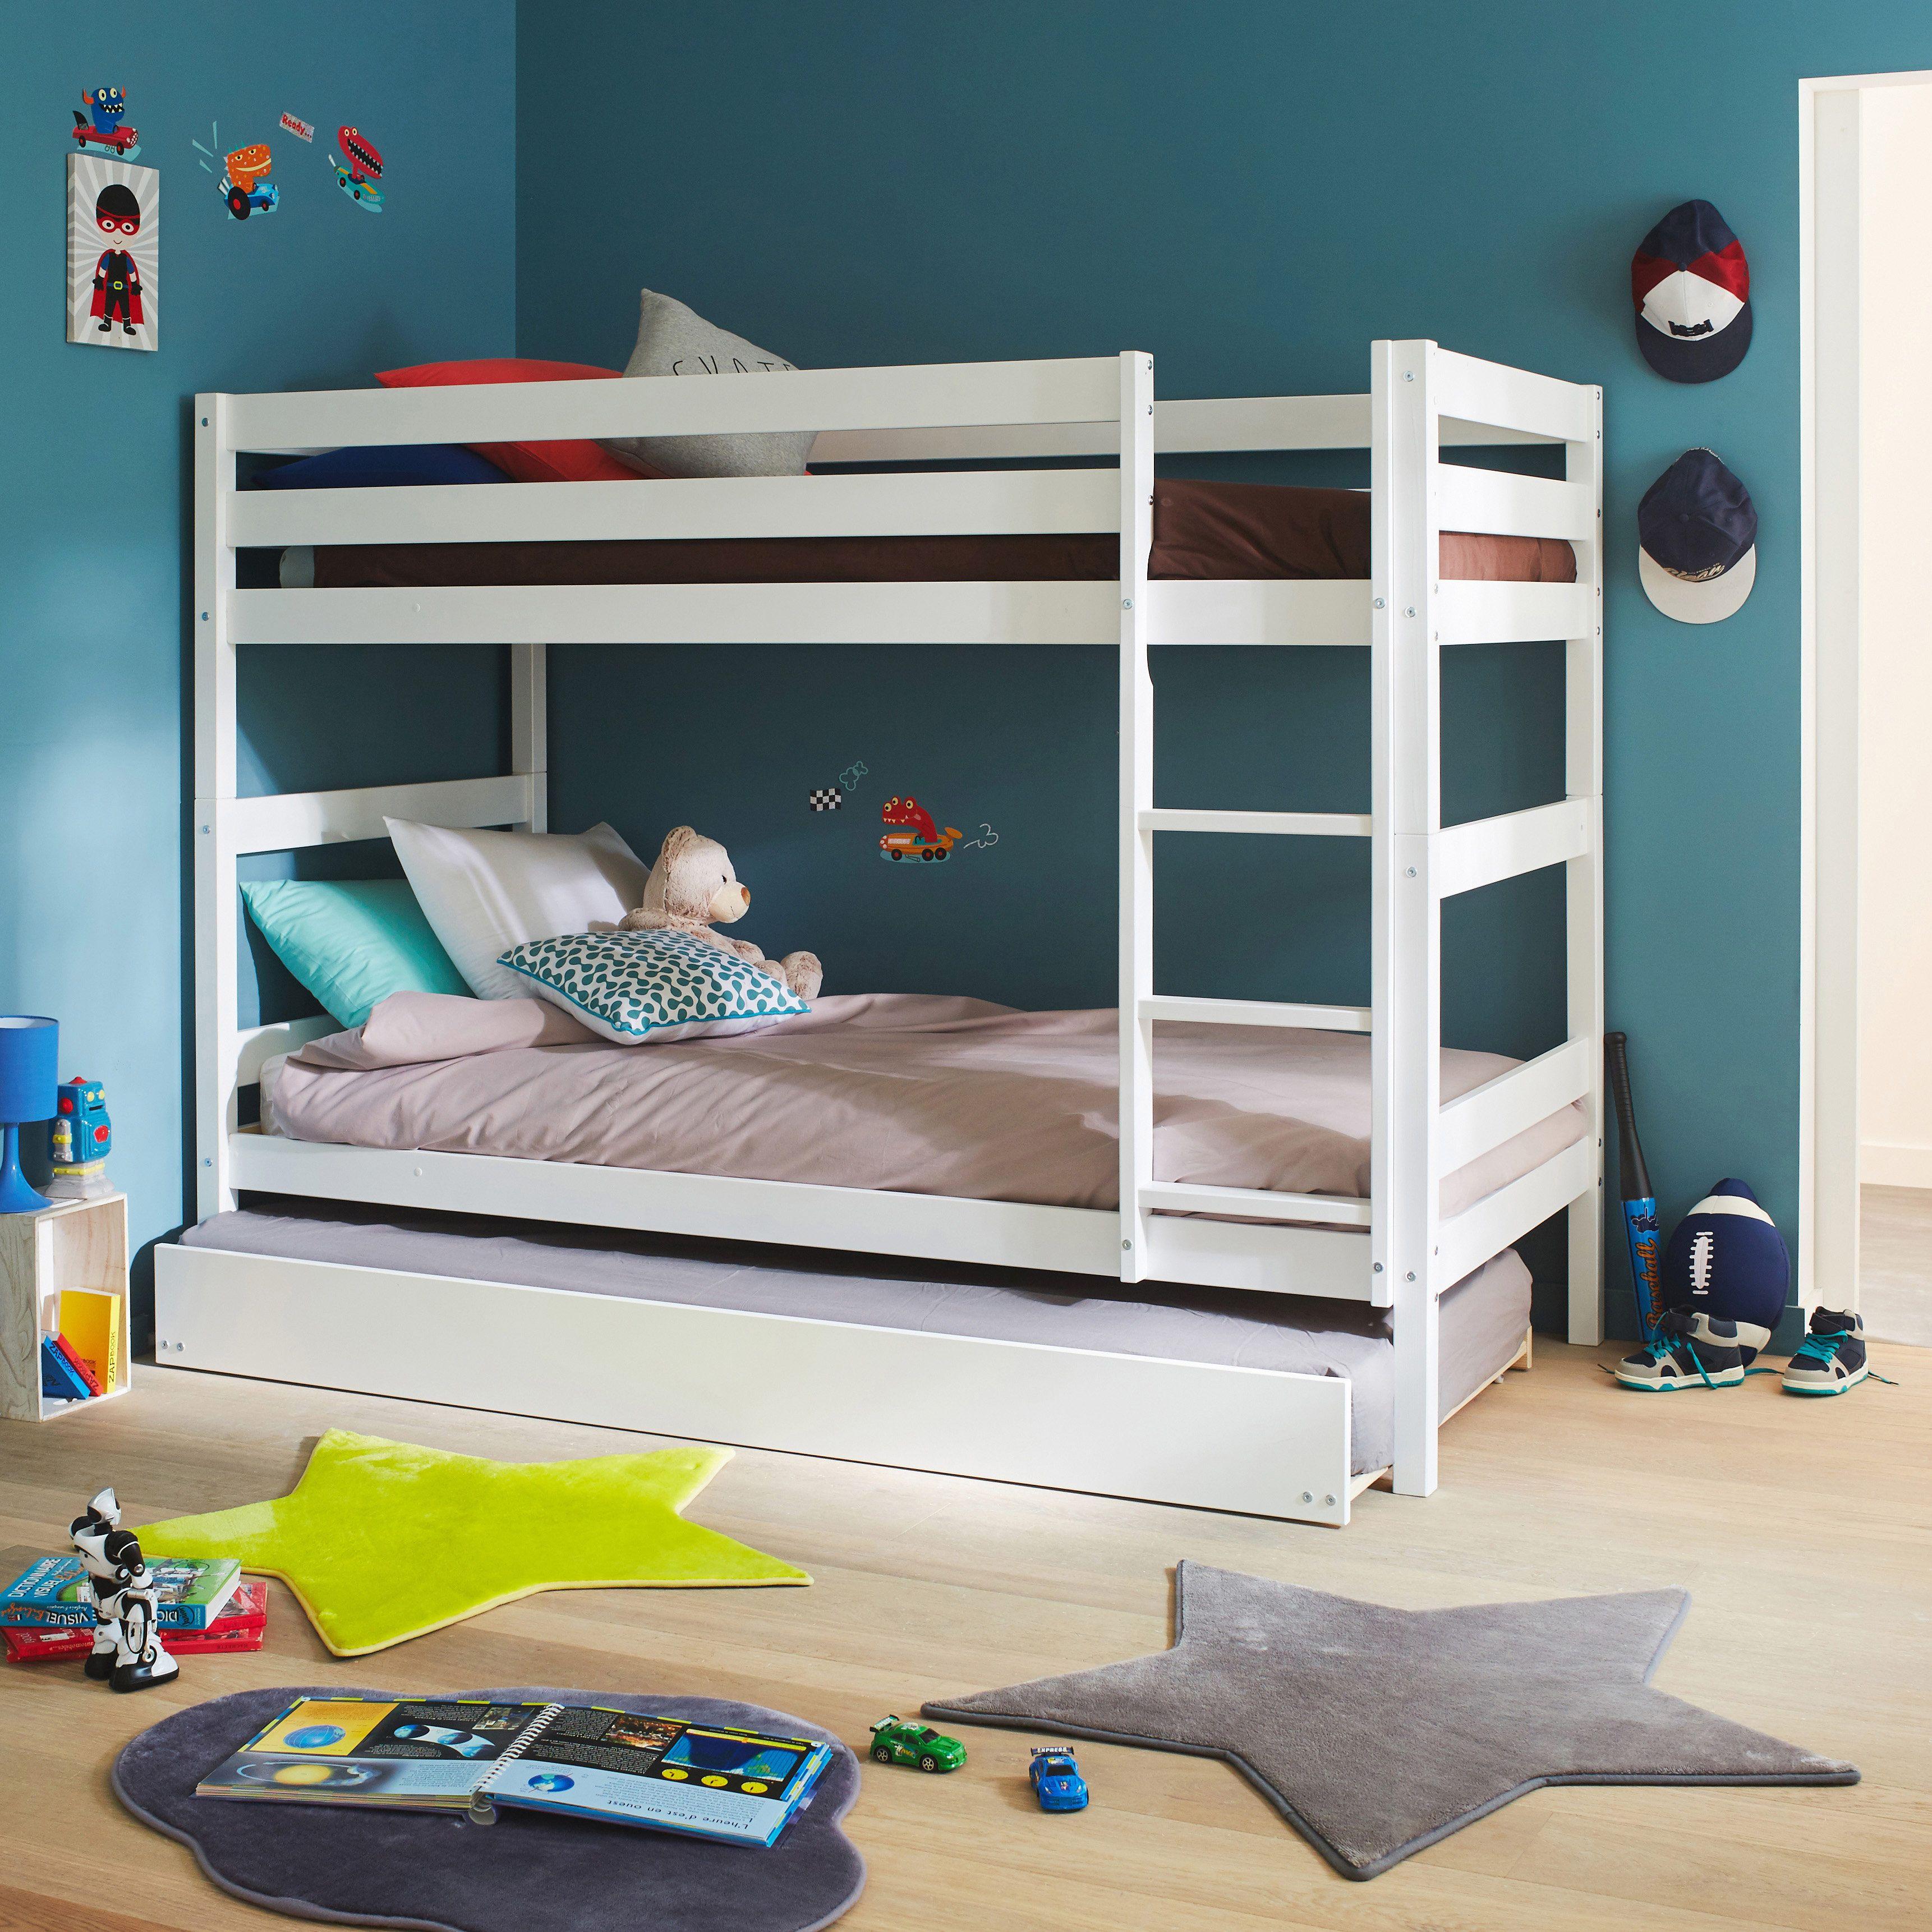 lit superpose alinea awesome alinea lit superpos montagne. Black Bedroom Furniture Sets. Home Design Ideas